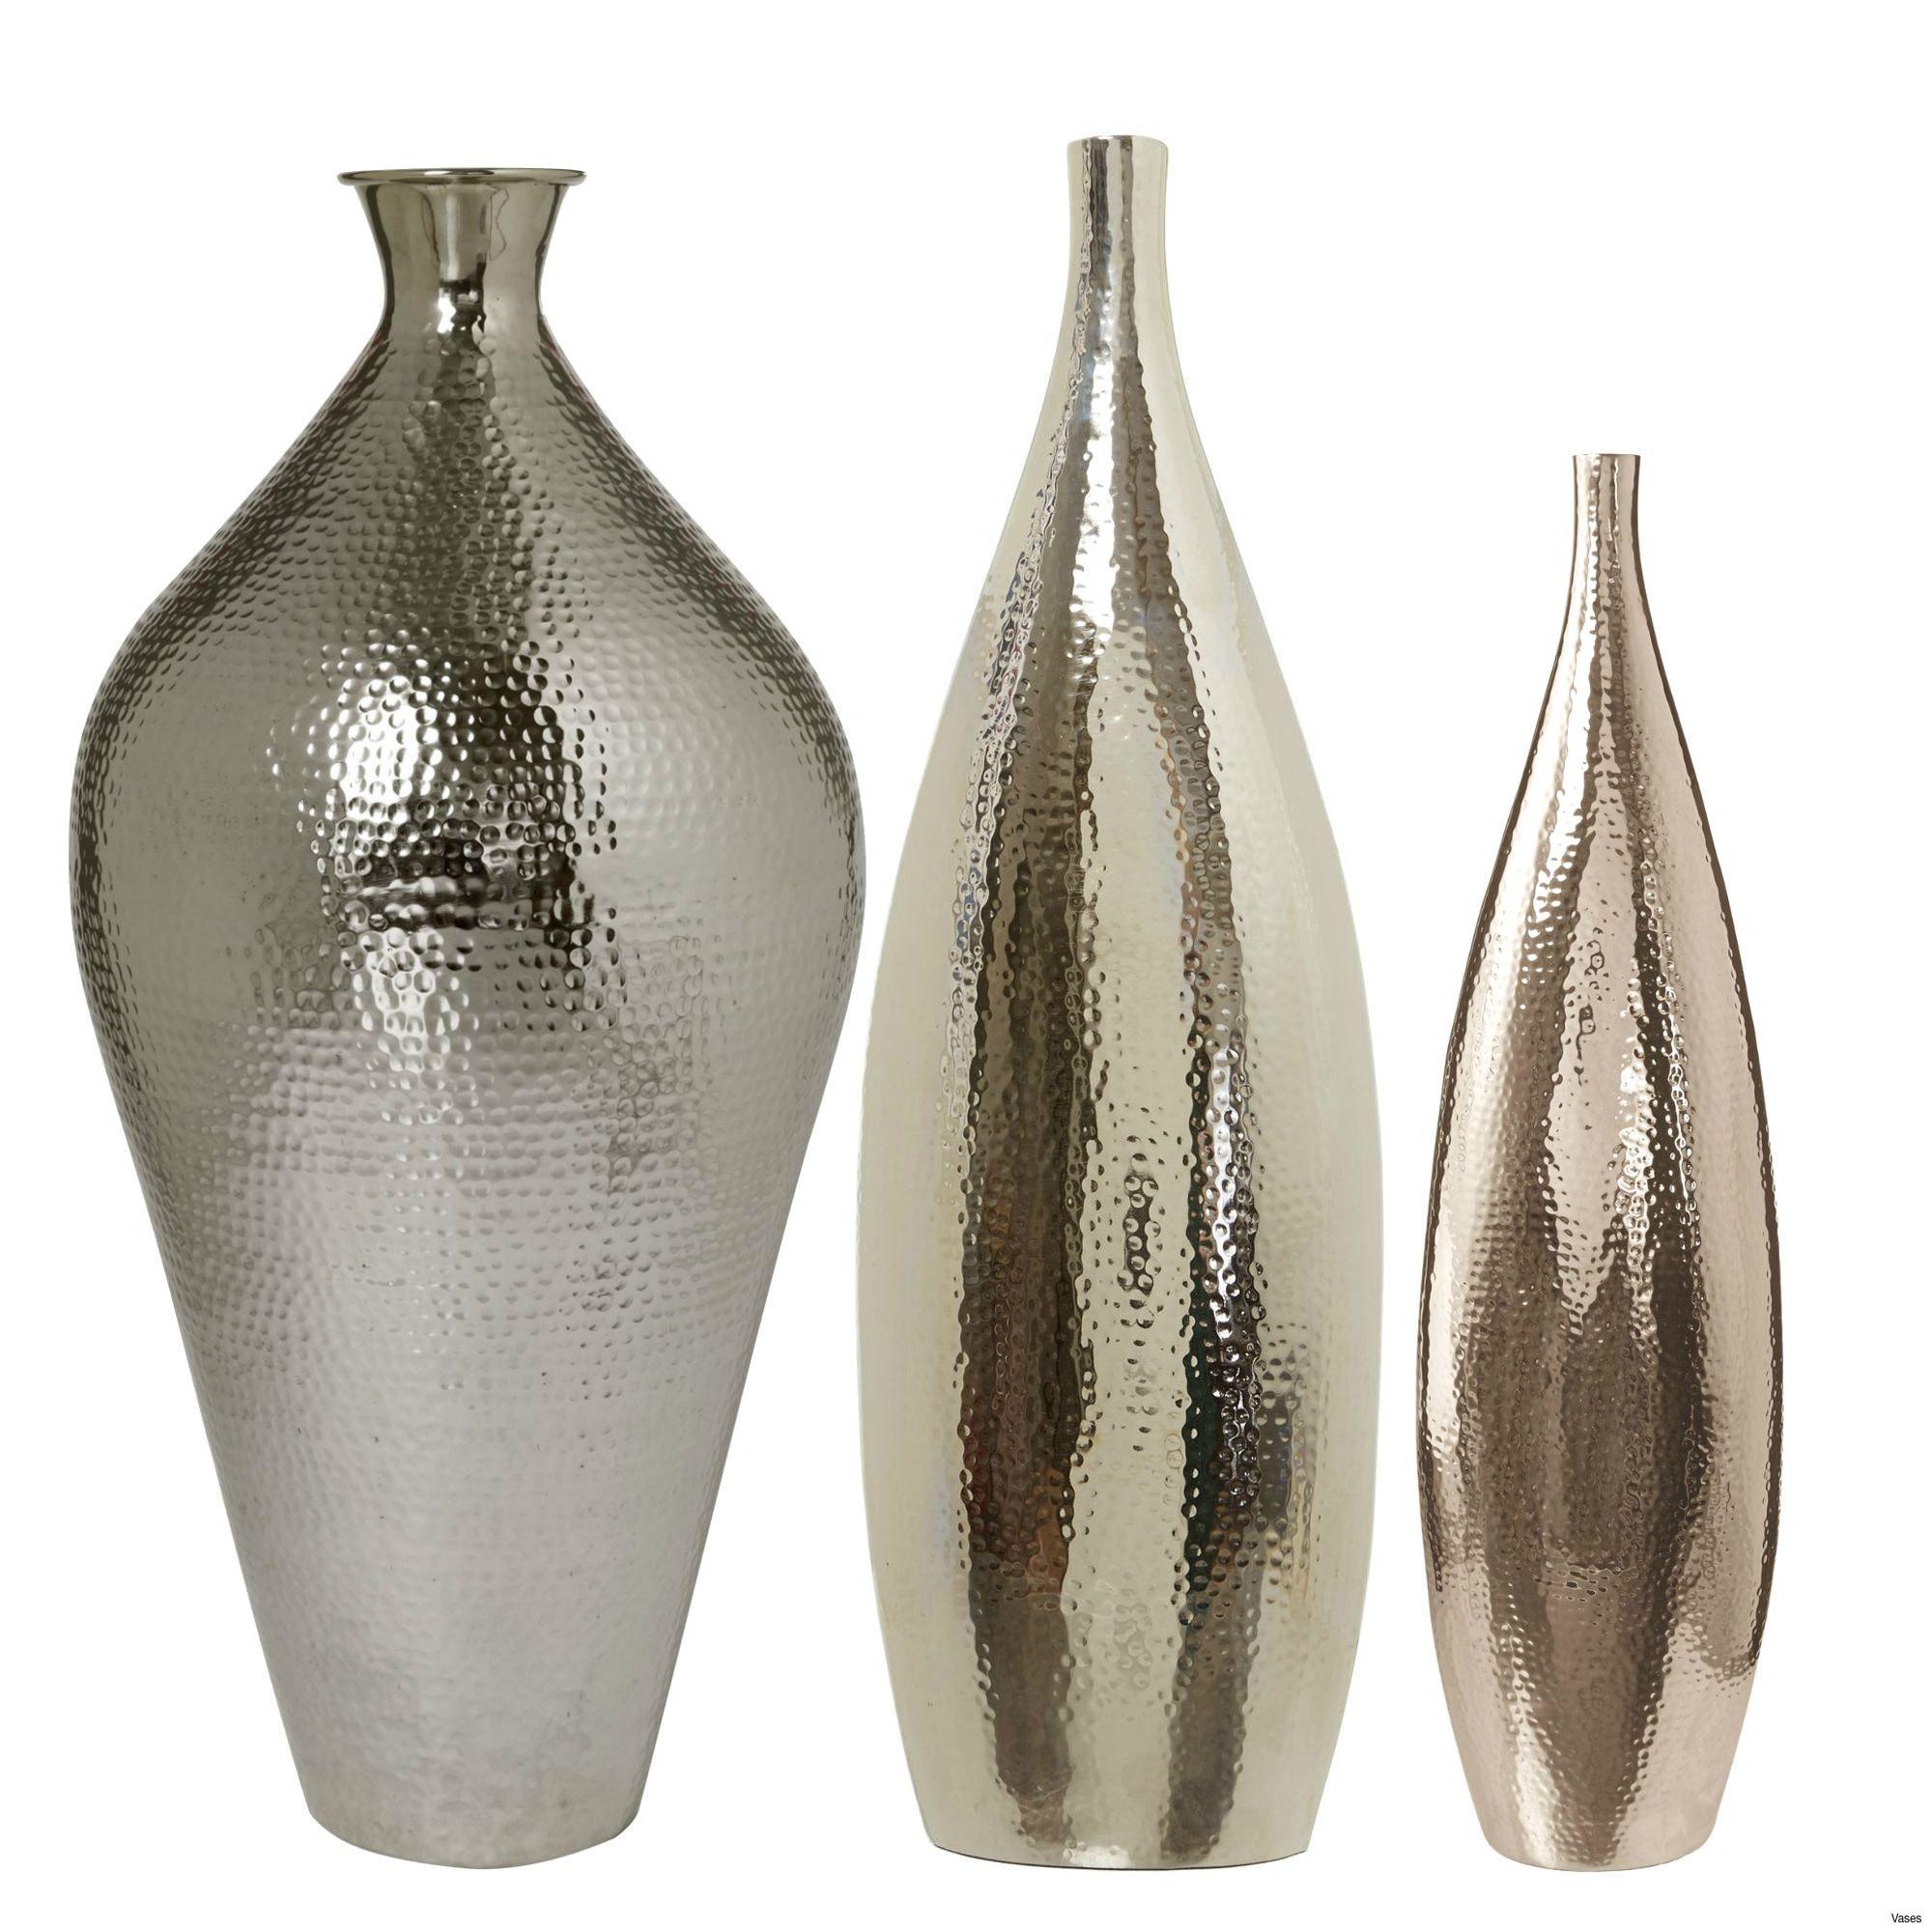 black glass floor vase of floor standing ornaments throughout a metal floor vase john salterini 09 06 14 sold 184